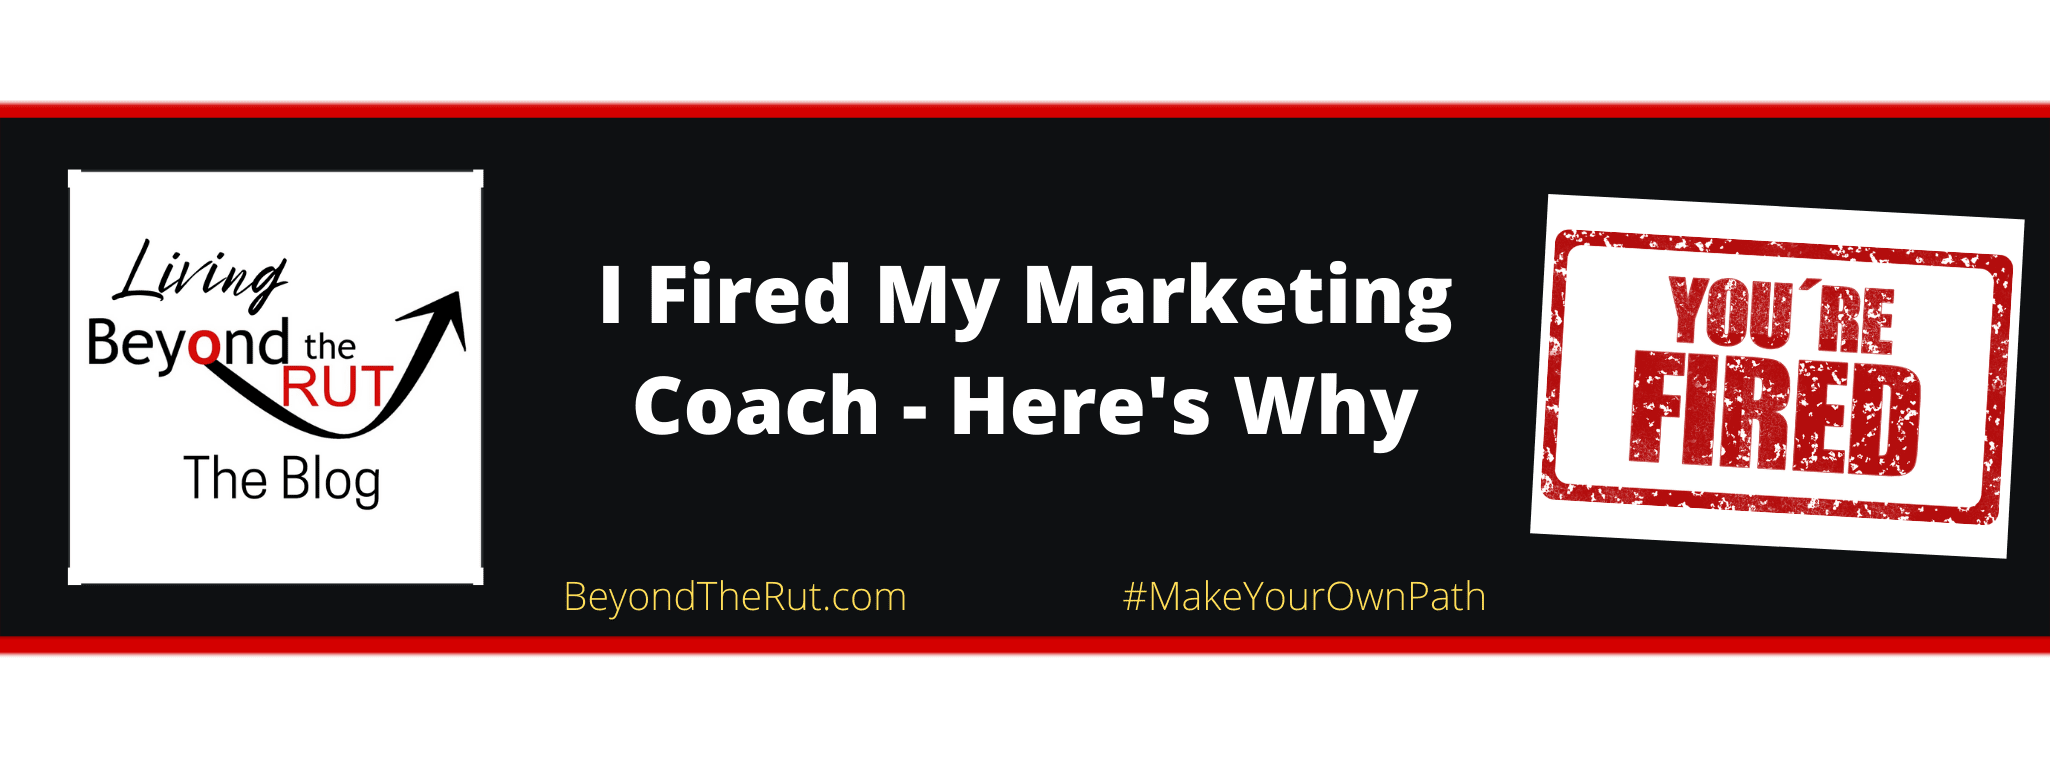 I Fired My Marketing Coach - Here's Why